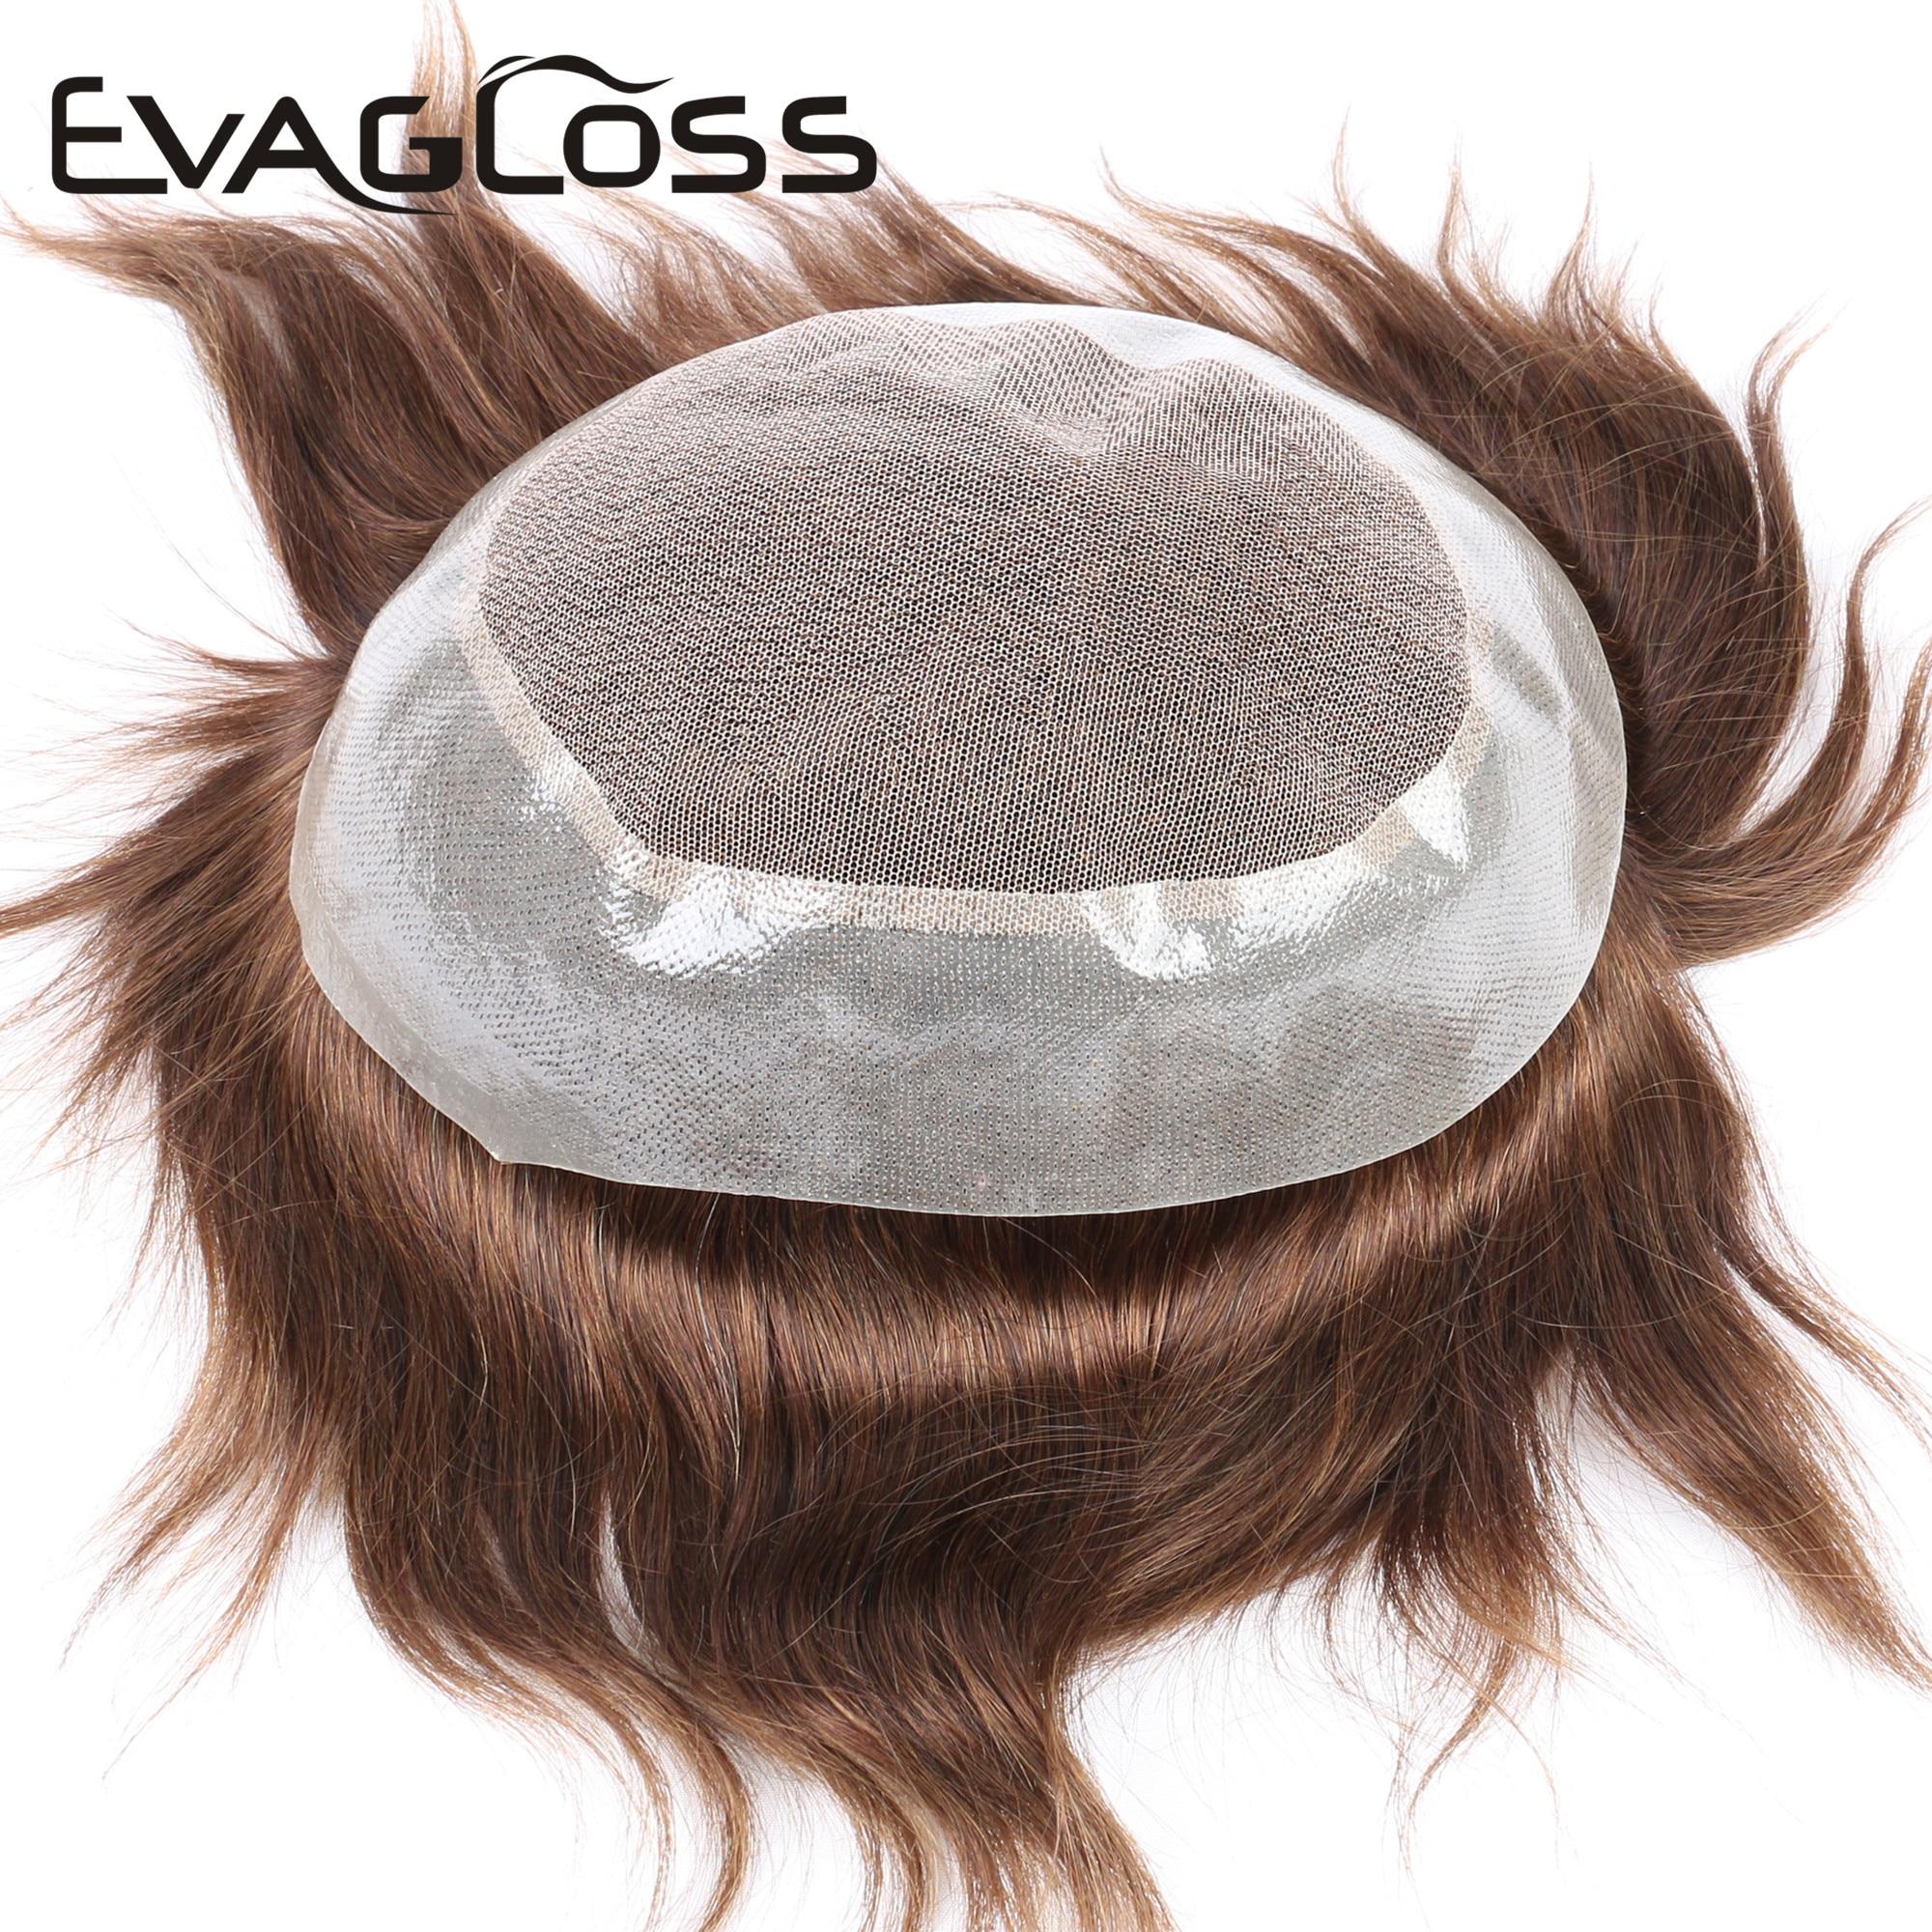 EVAGLOSS Swiss Top PU Around 100% Natural Human Hair Men's Wig Toupee Hairpieces